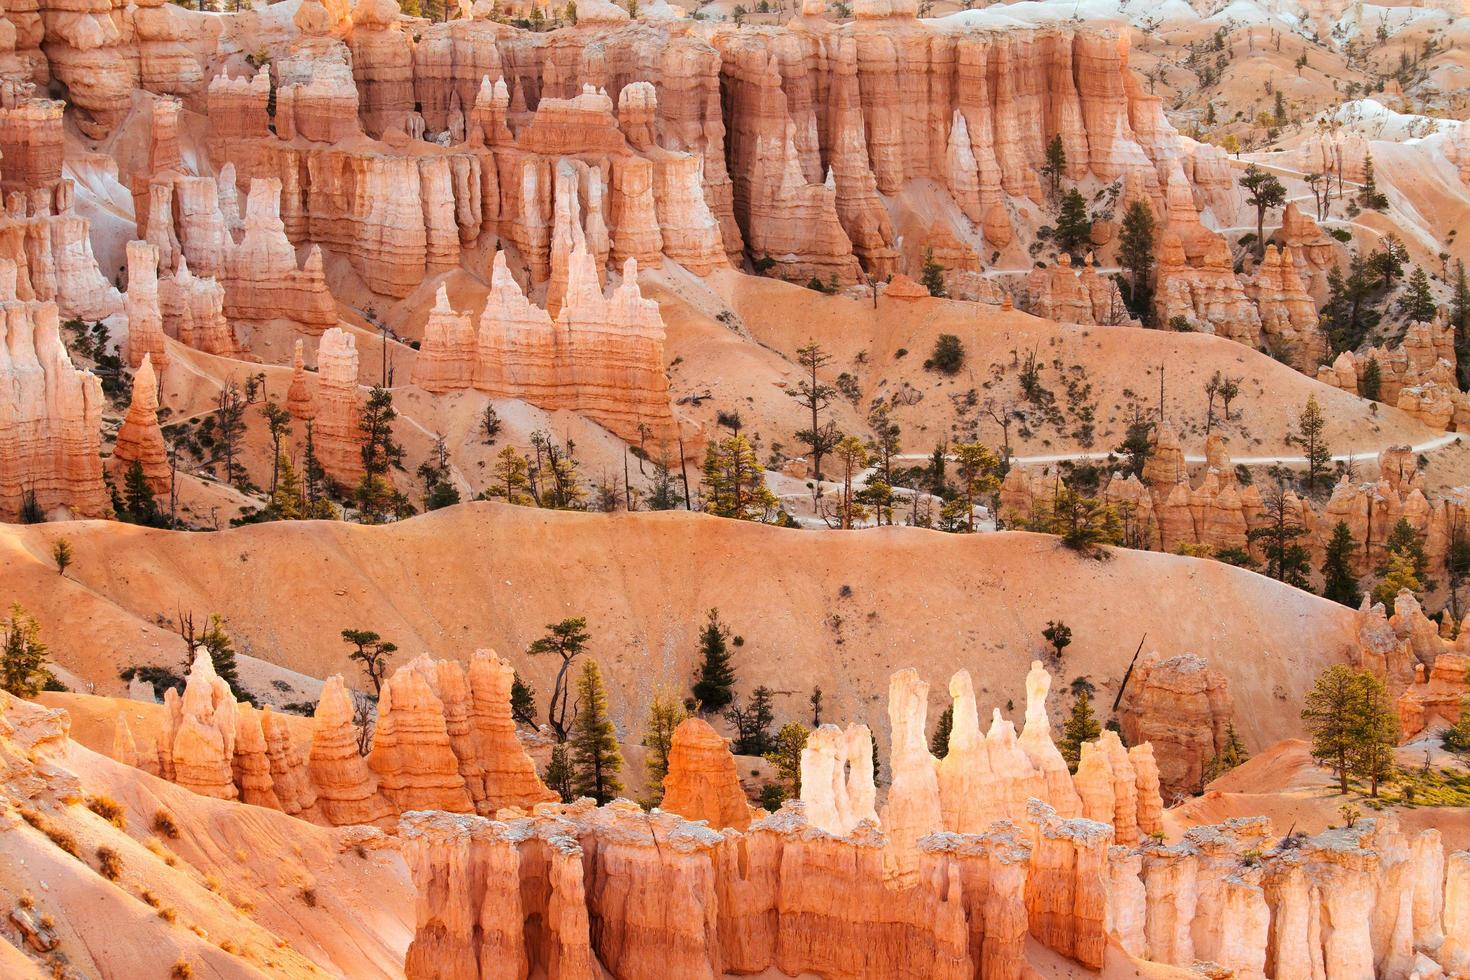 Säulen im Nationalpark Bryce Canyon foto